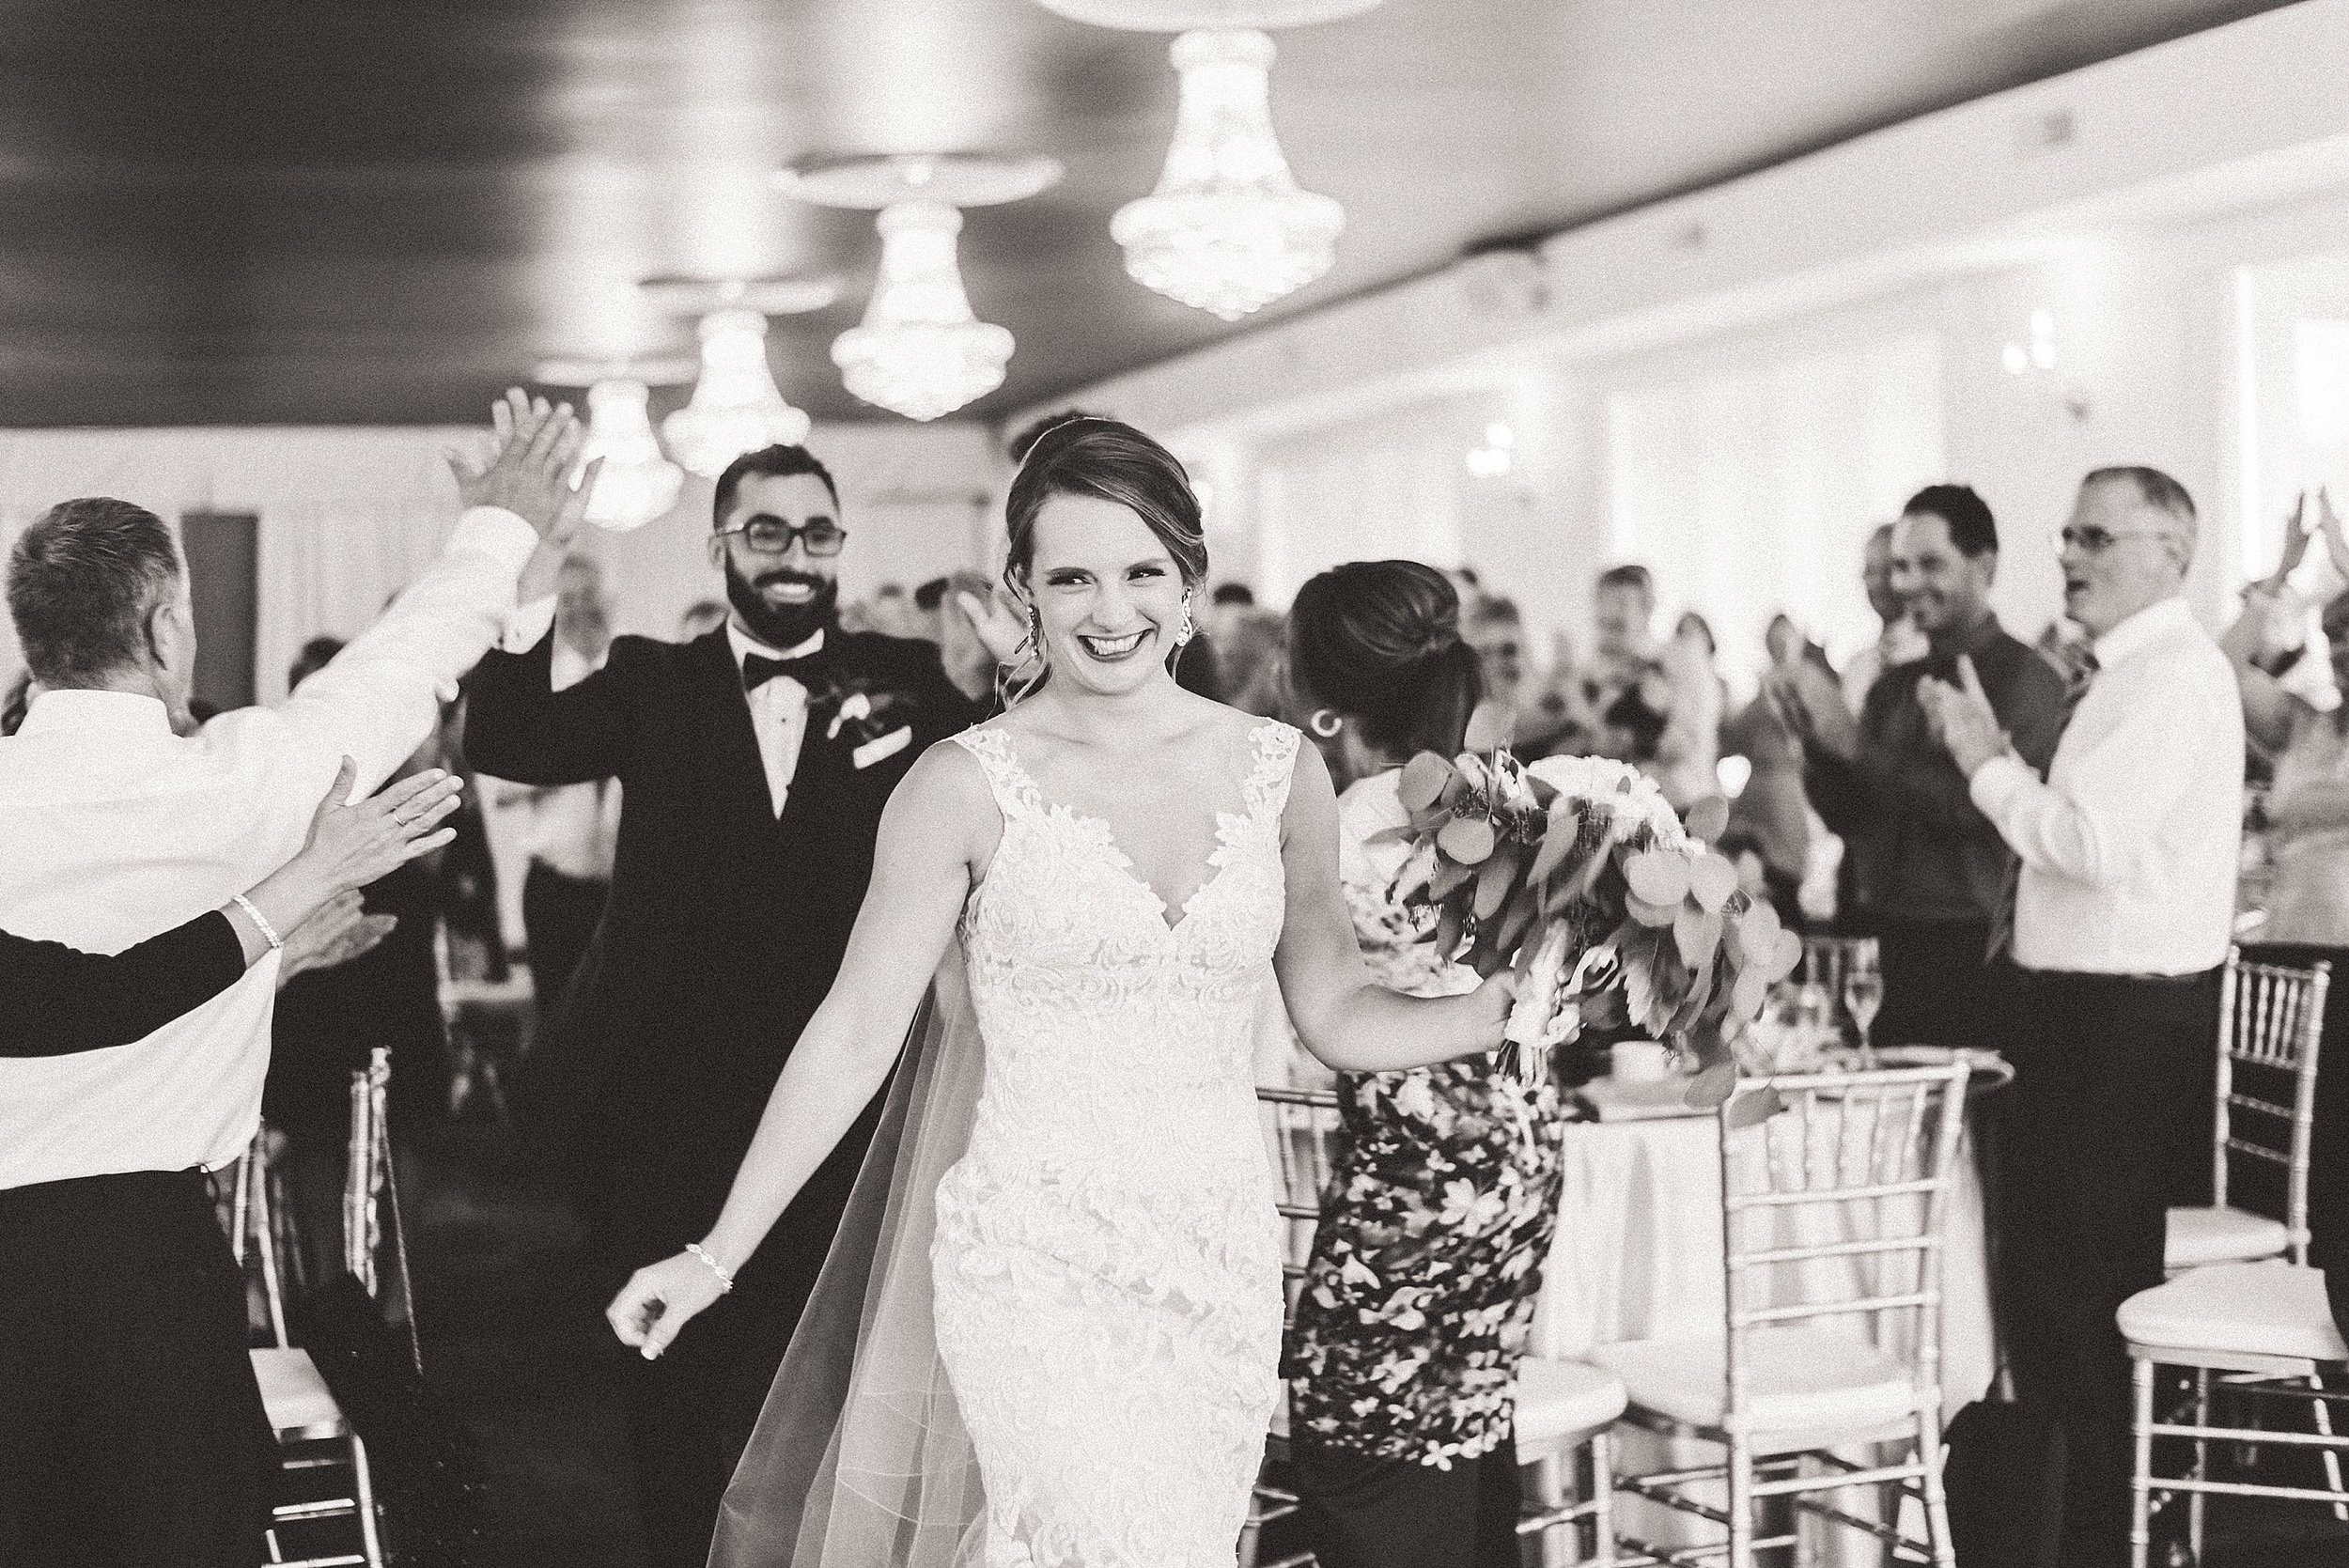 light airy indie fine art ottawa wedding photographer | Ali and Batoul Photography_1331.jpg